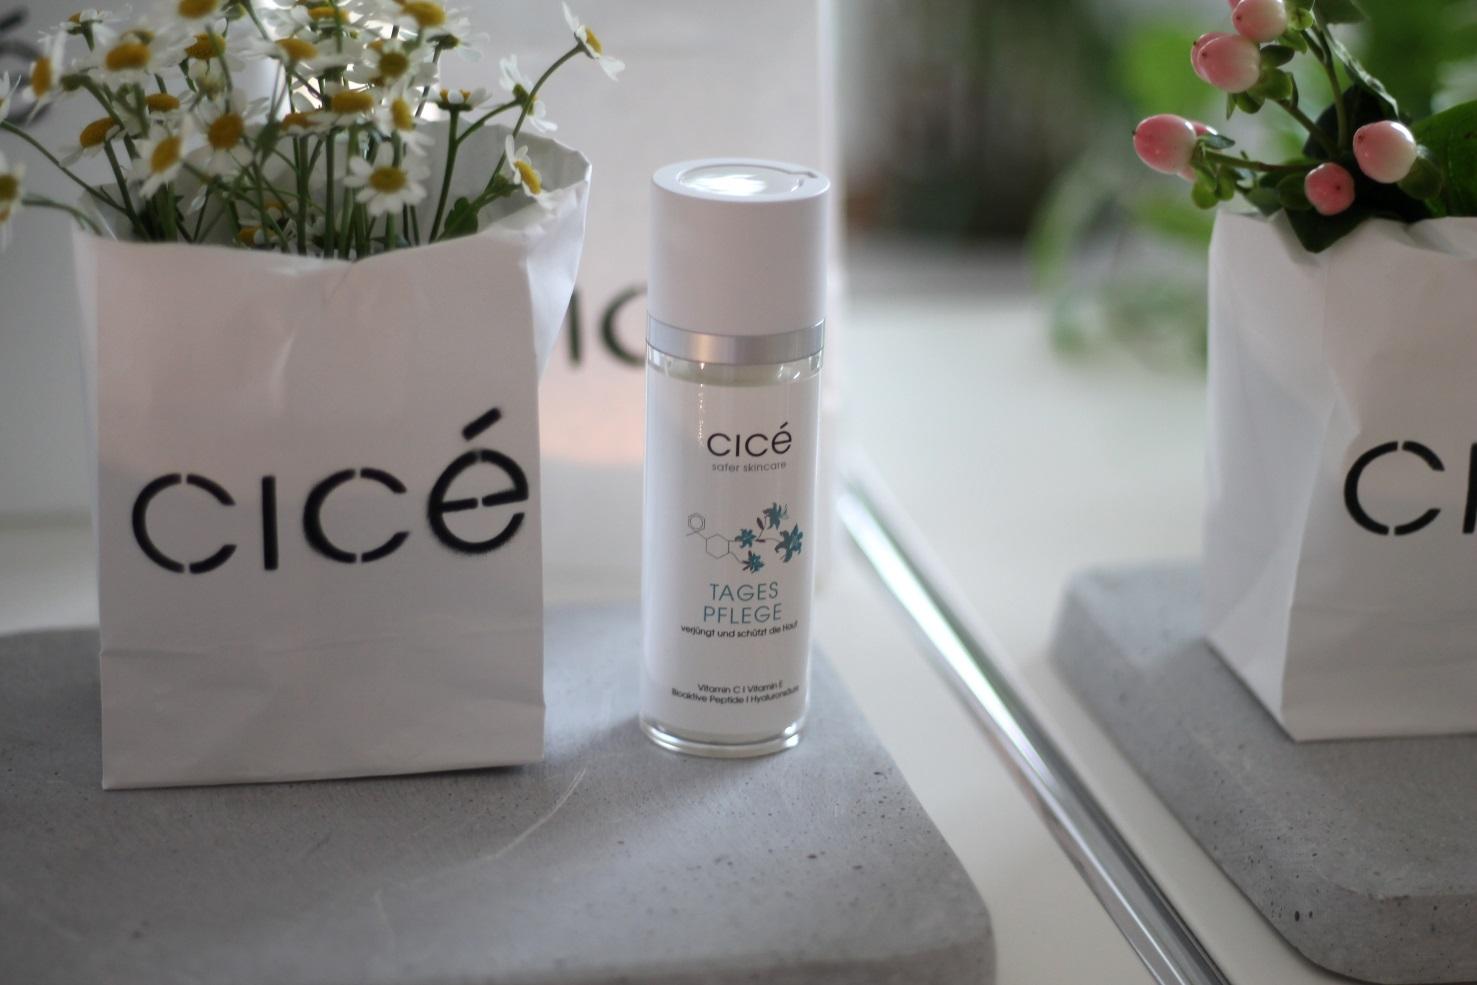 cice safer skincare neue tagespflege